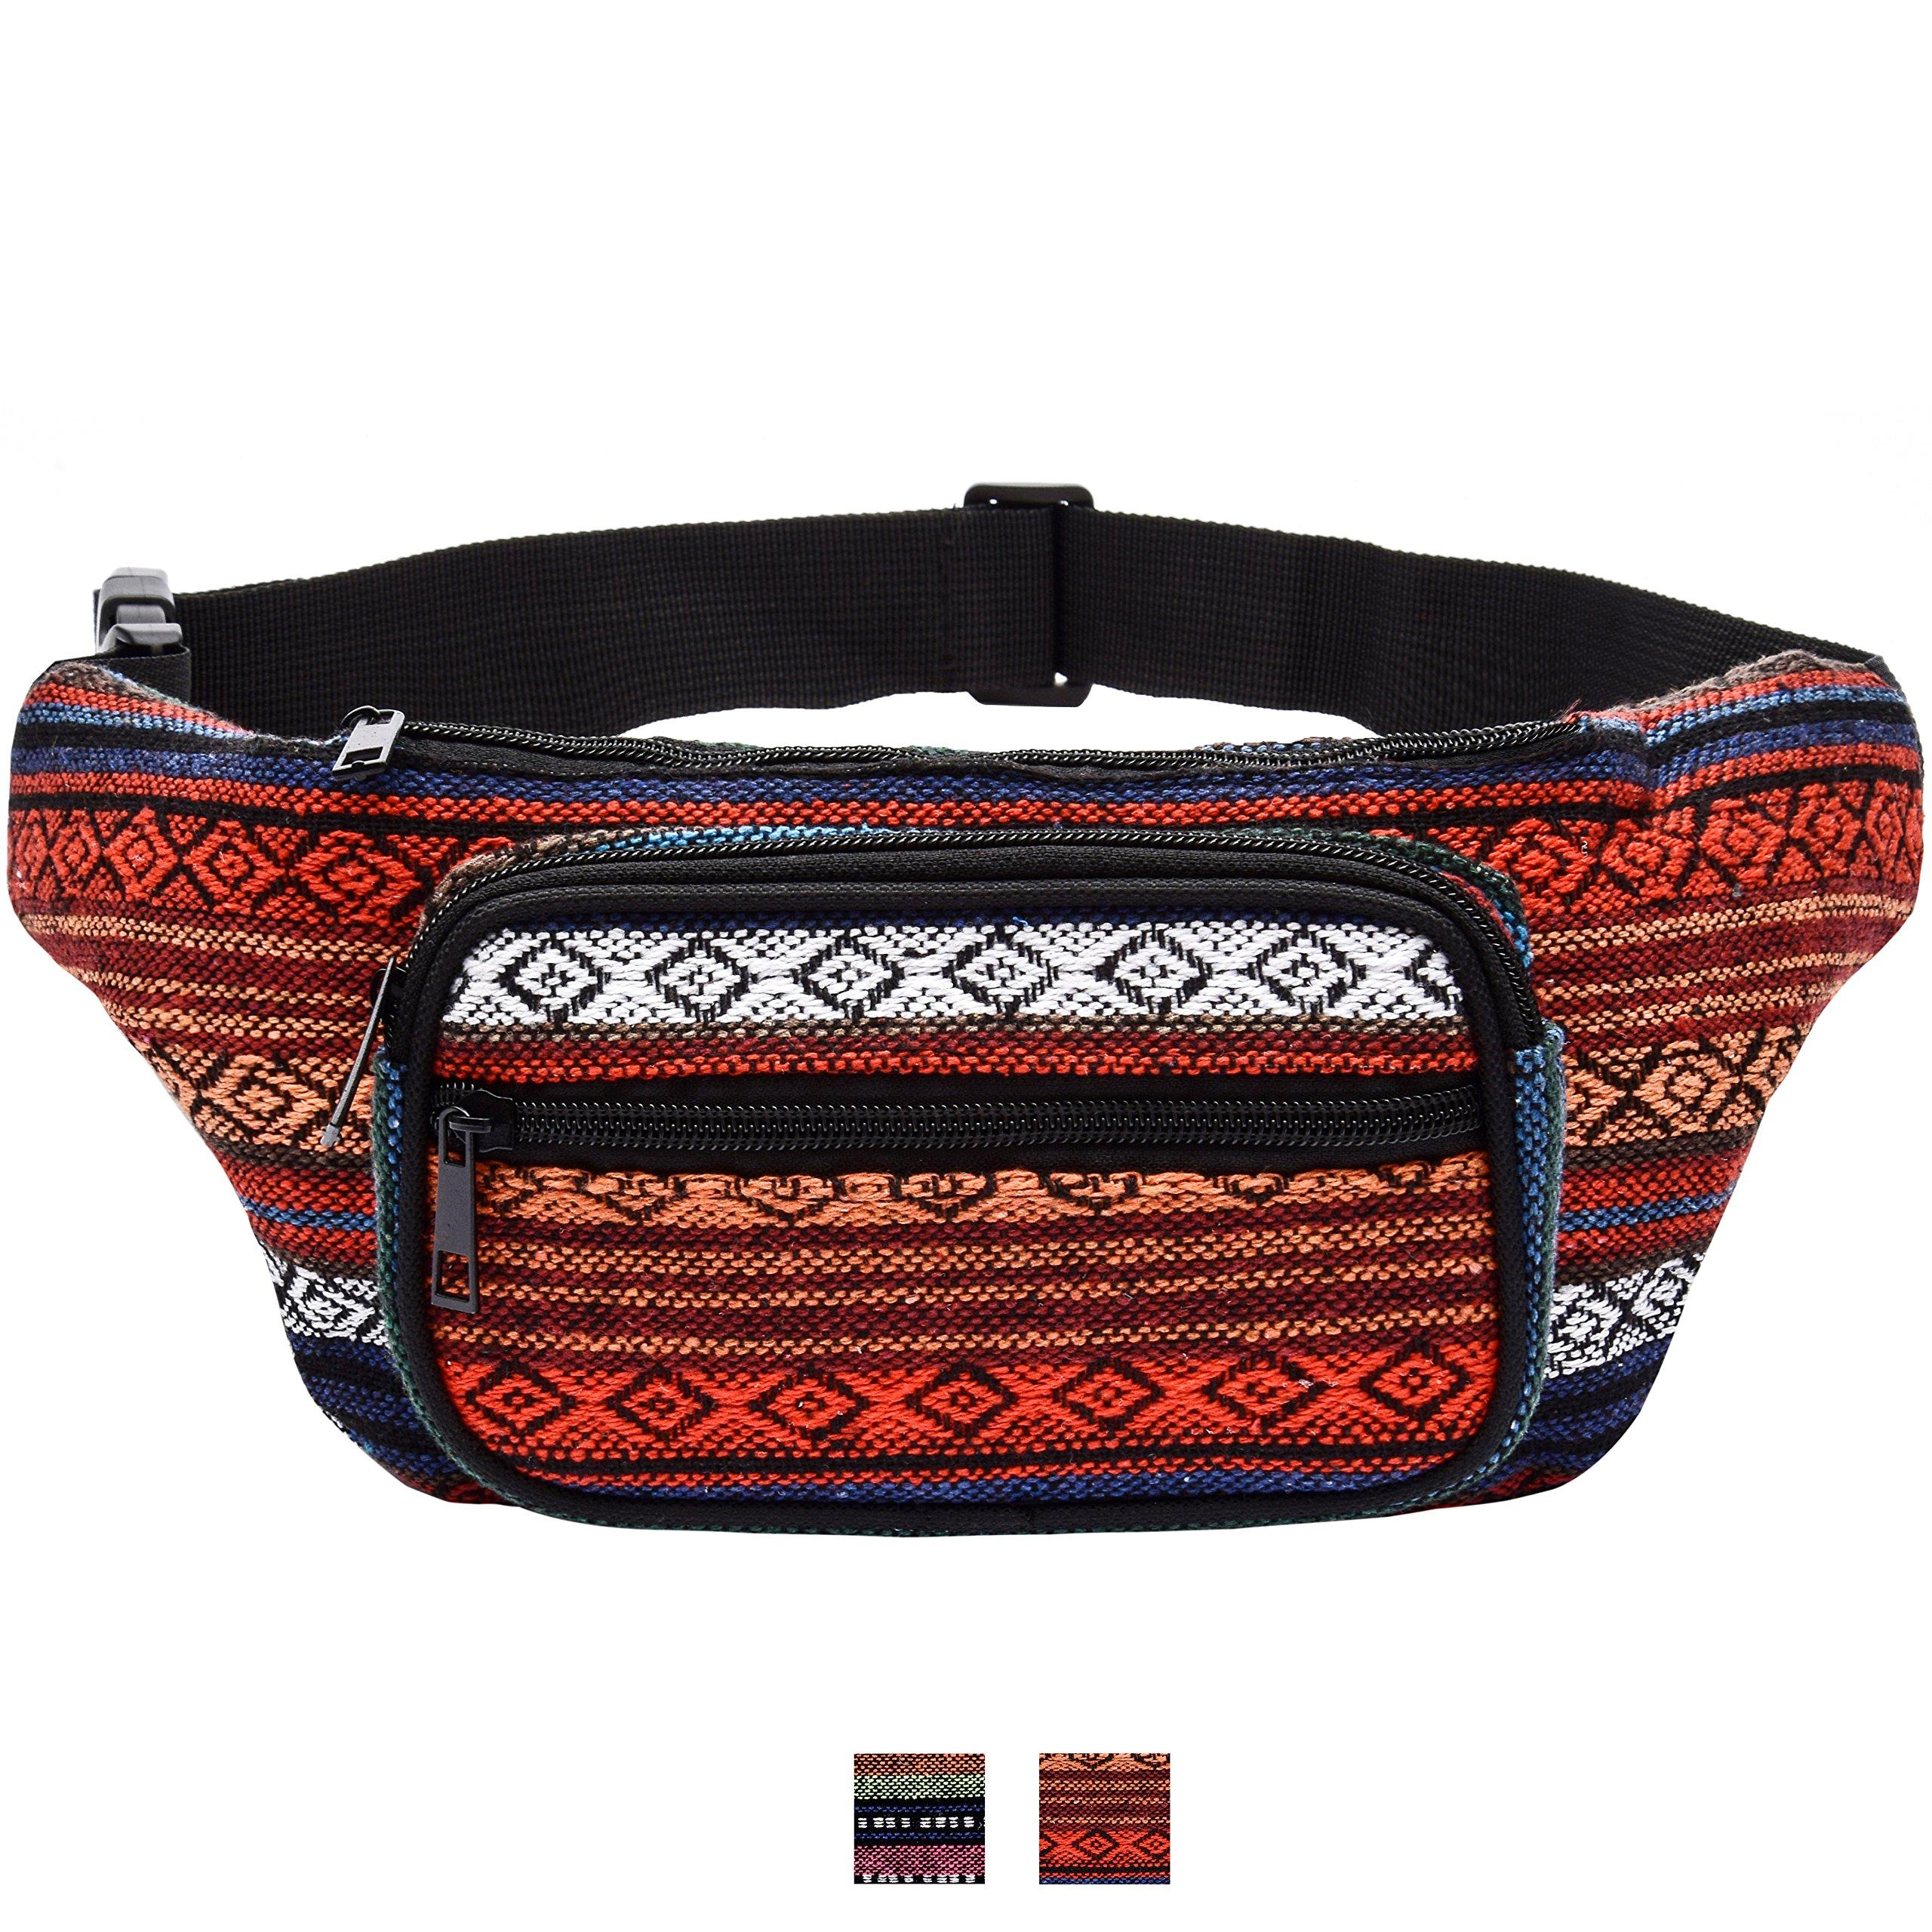 Kayhoma Boho Fanny Pack Stripe Festival Retro Vintage Flat Bum Bags Travel Hiking Hip Bum Waist Bag (Red)